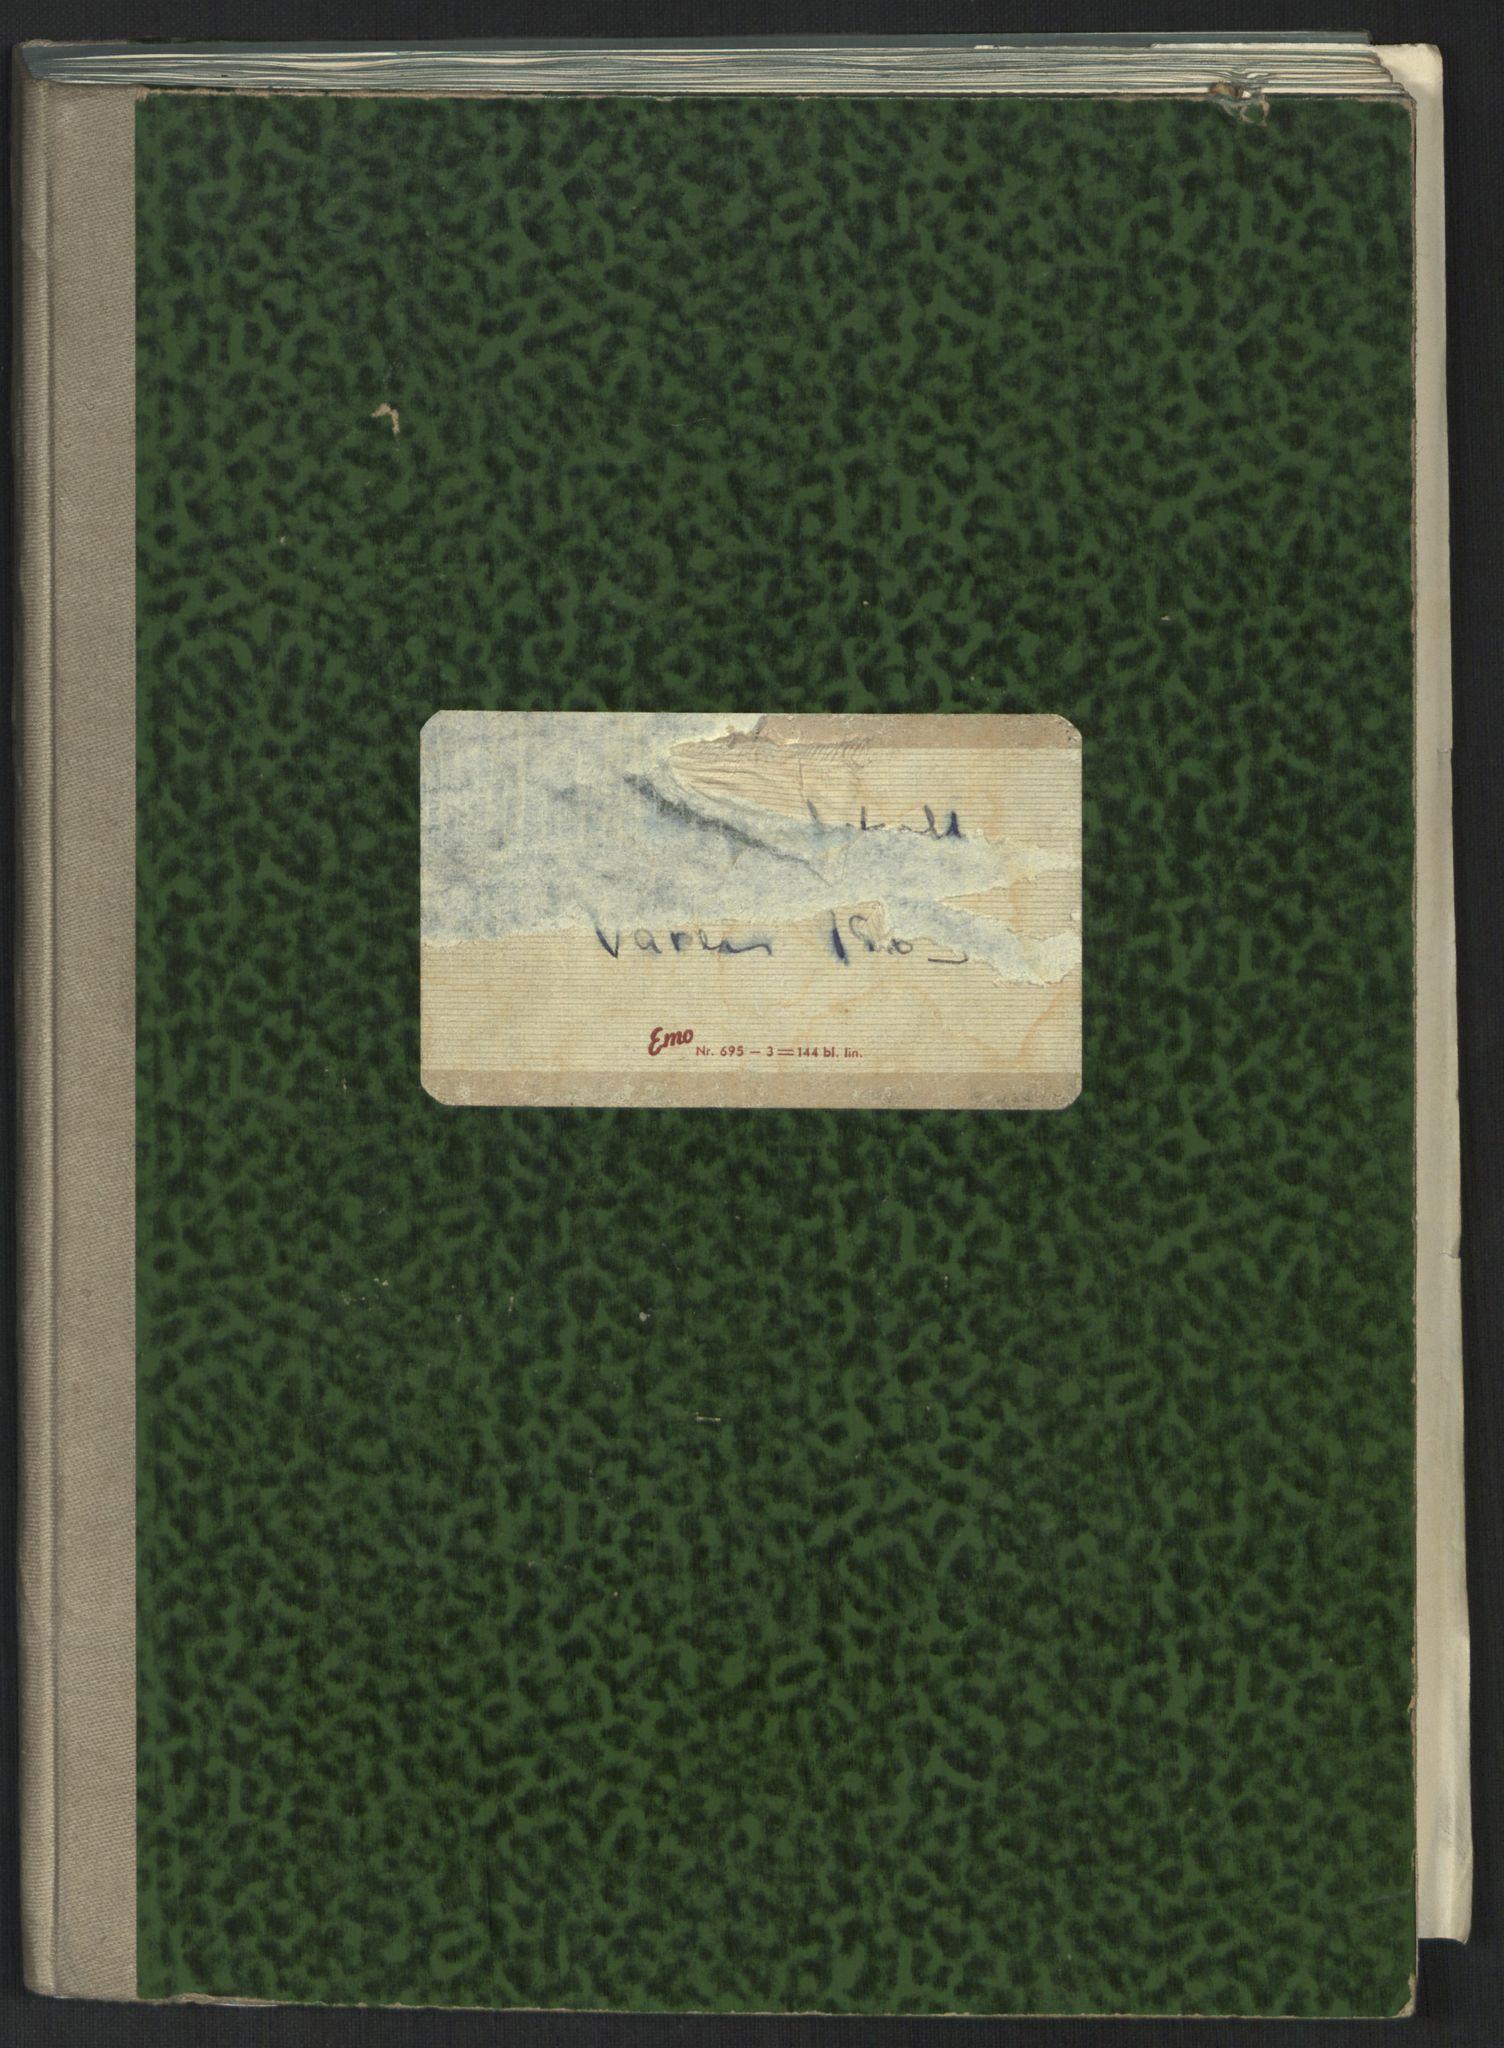 RA, Det Norske Studentersamfund, A/Ac/L0020: Møteprotokoller, 1963